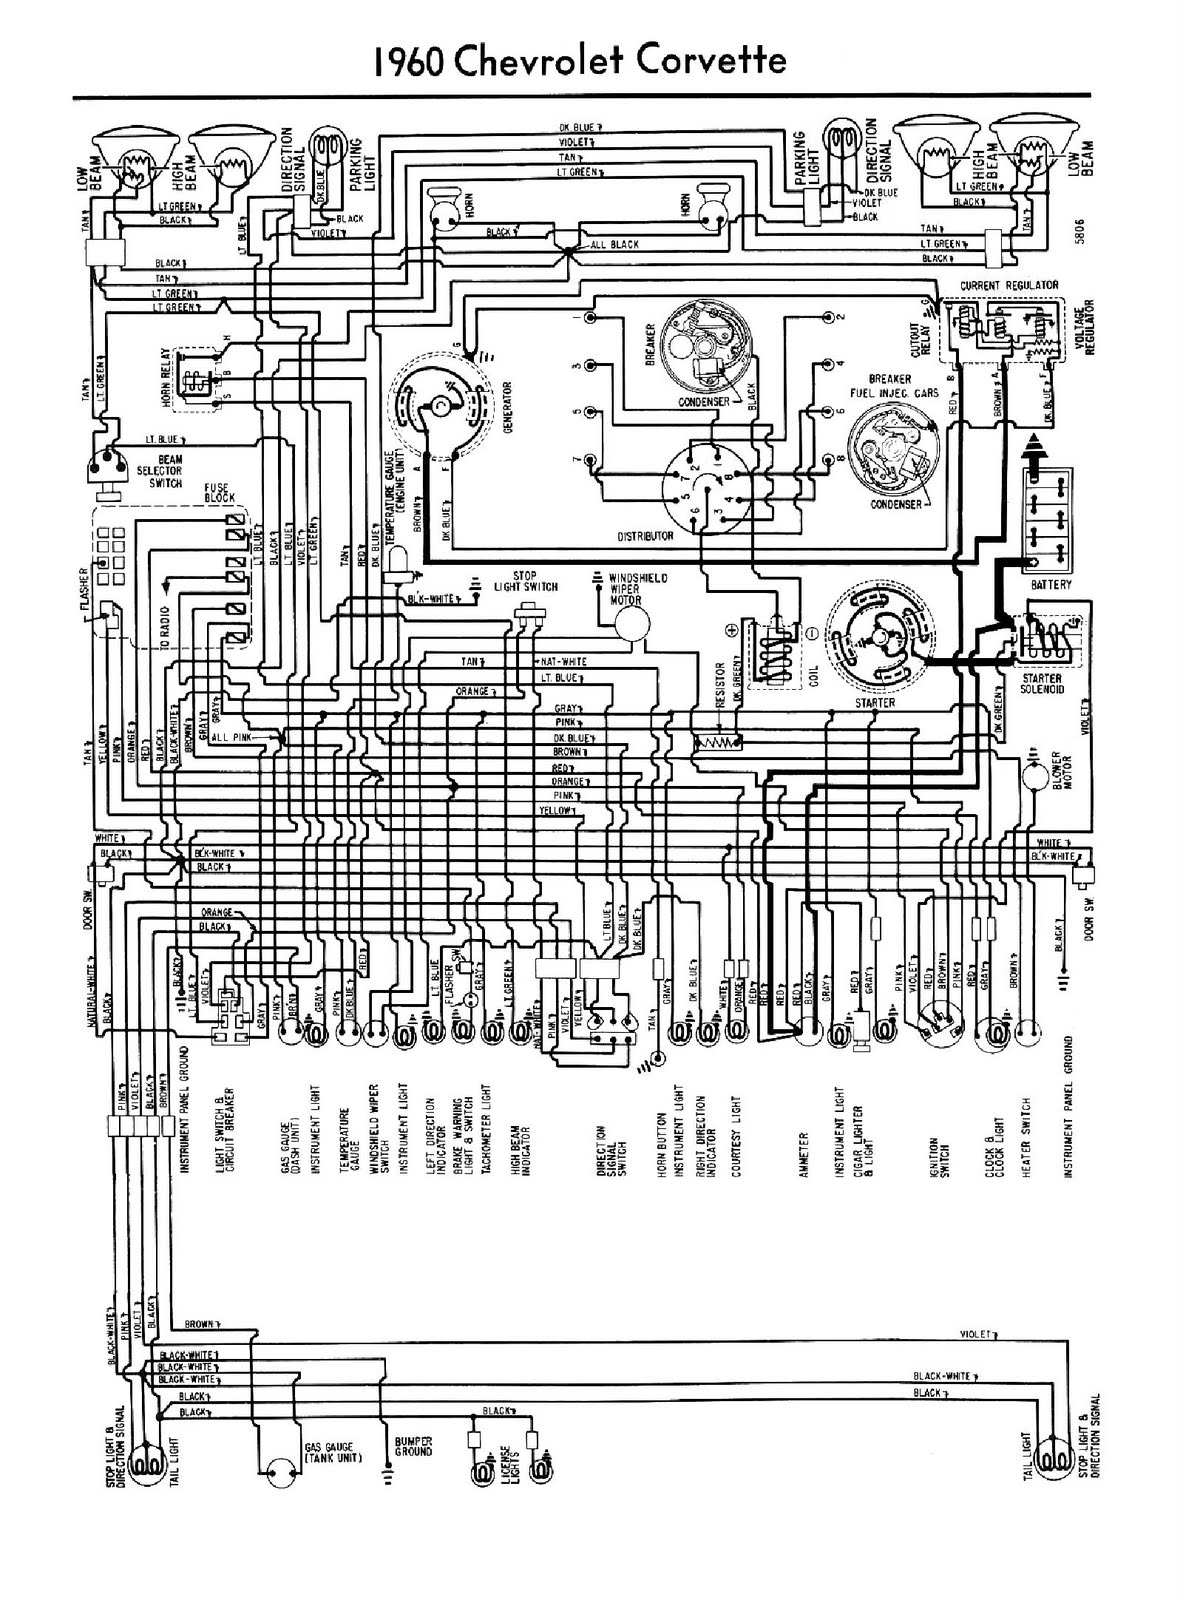 medium resolution of 1960 corvette wiring diagram free vehicle wiring diagrams u2022 rh generalinfo co 1986 chevy truck wiring 1957